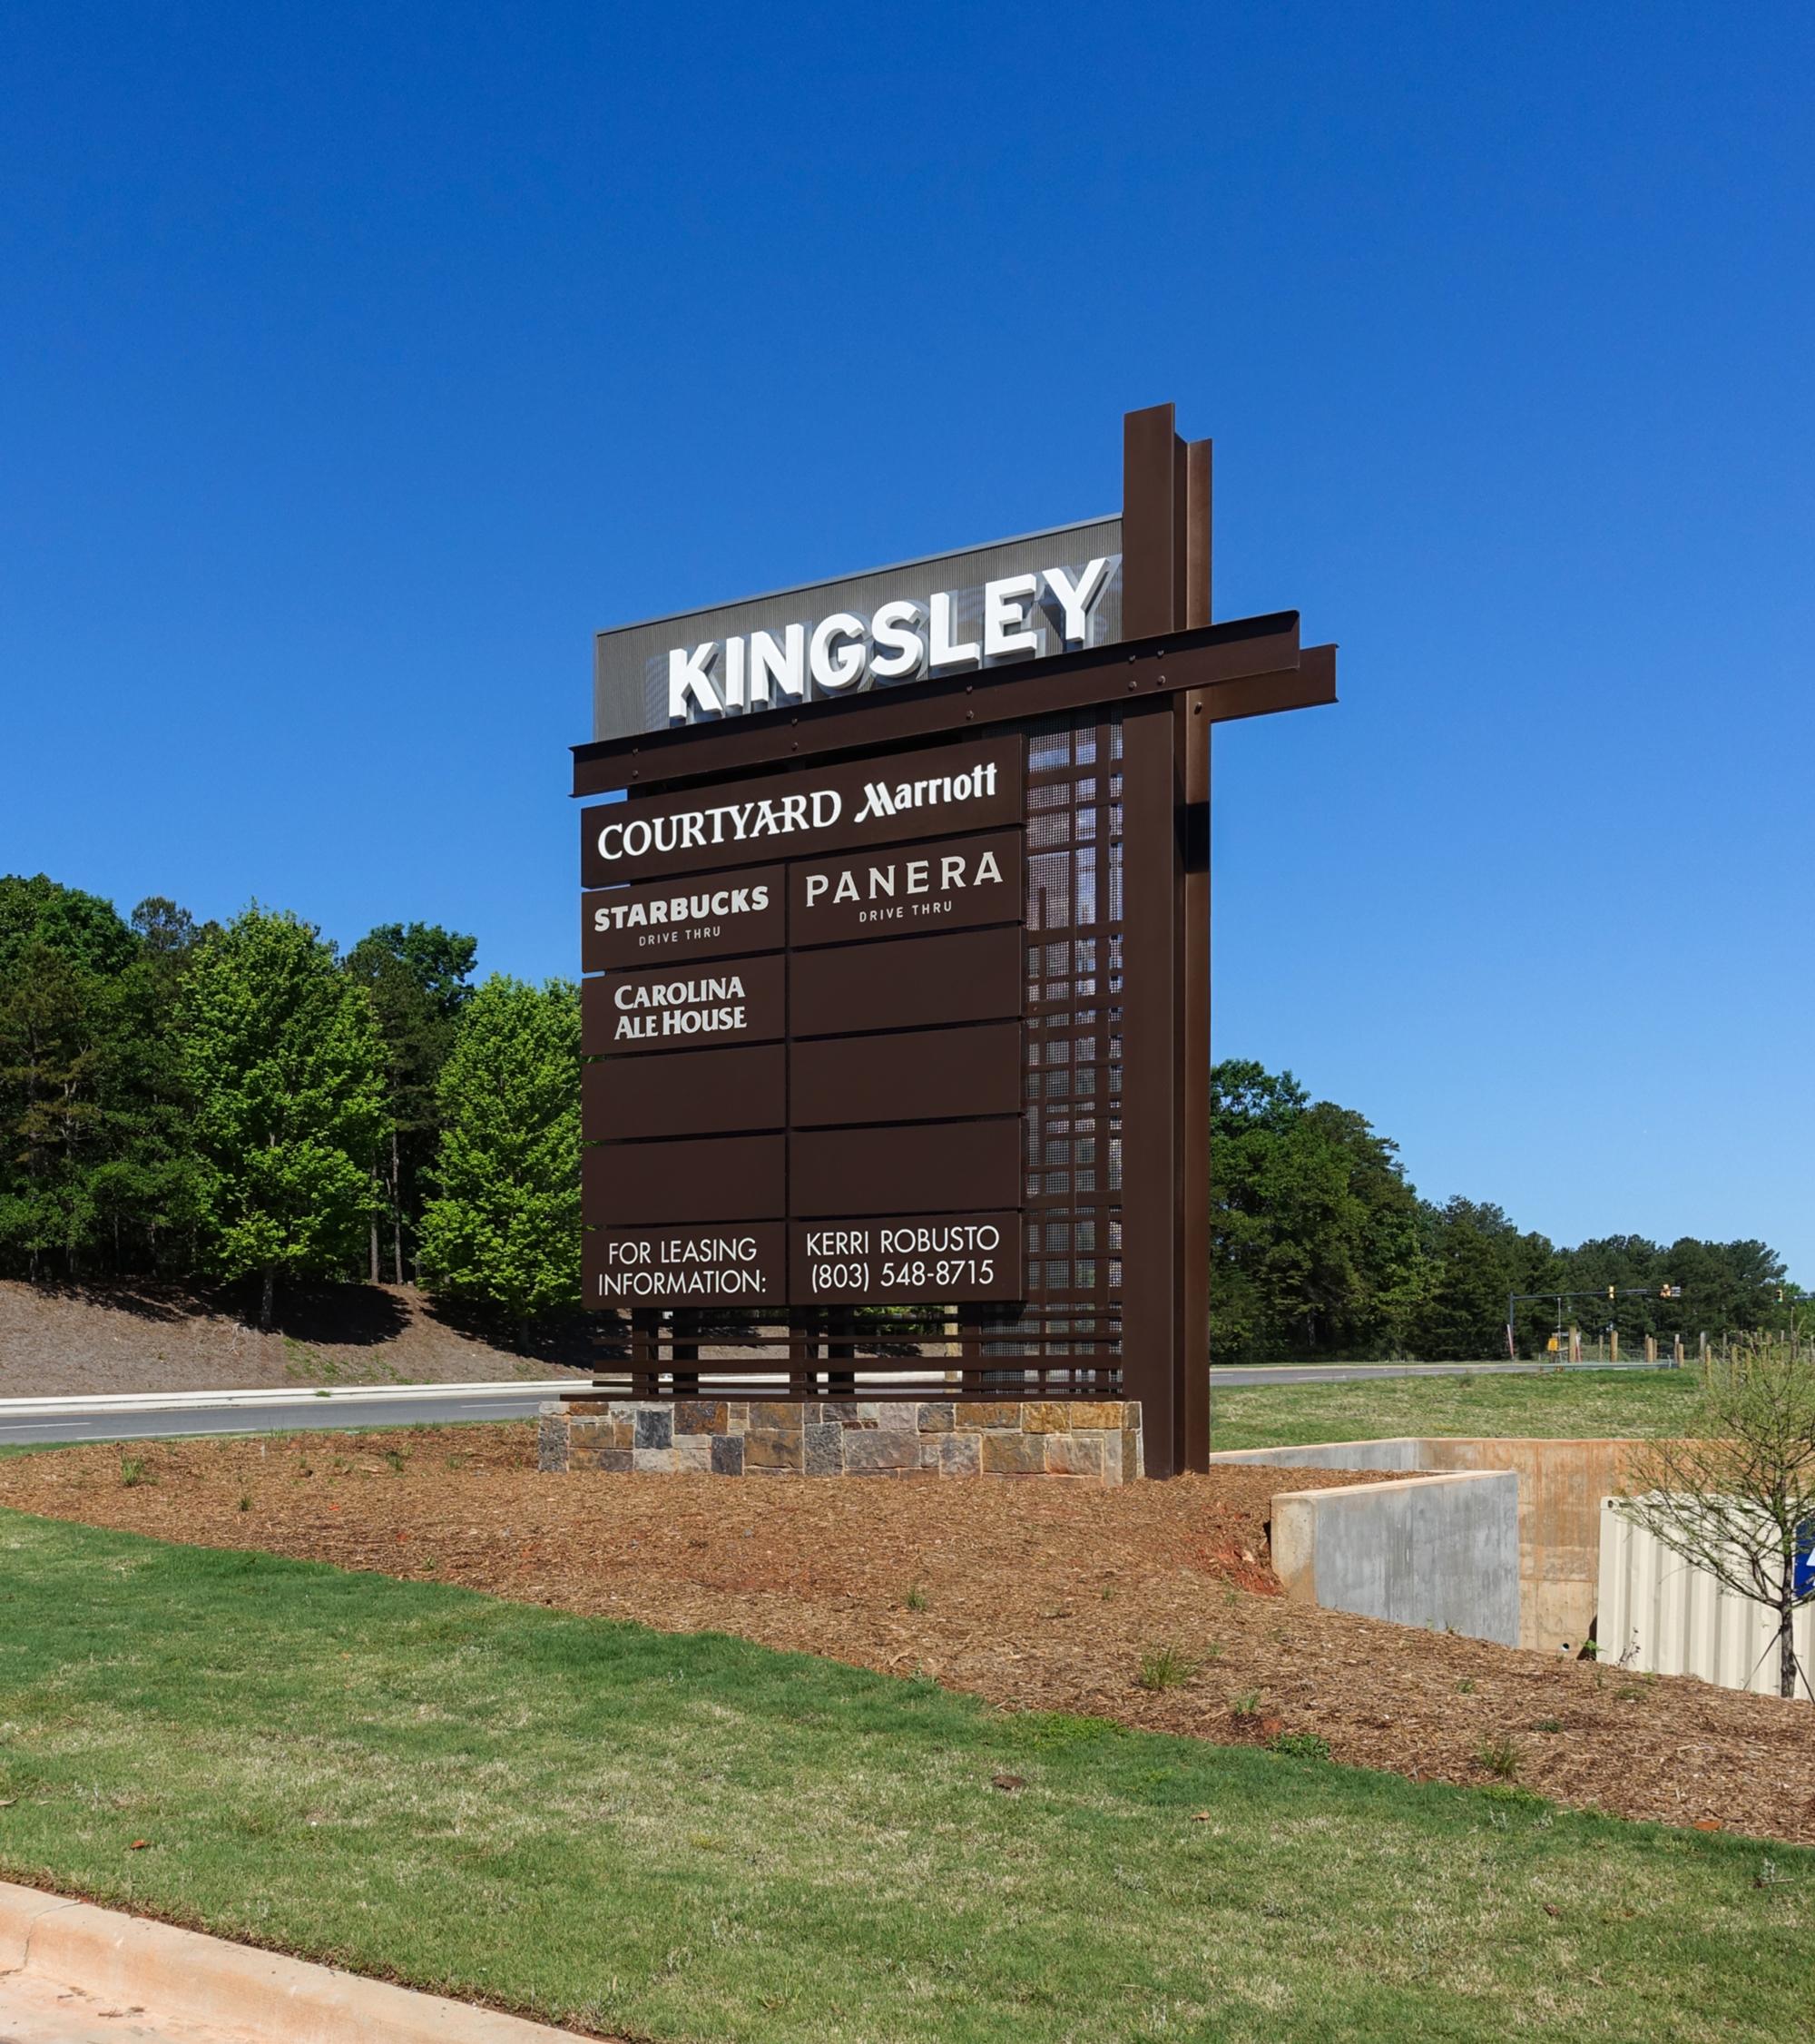 Kingsley Signage